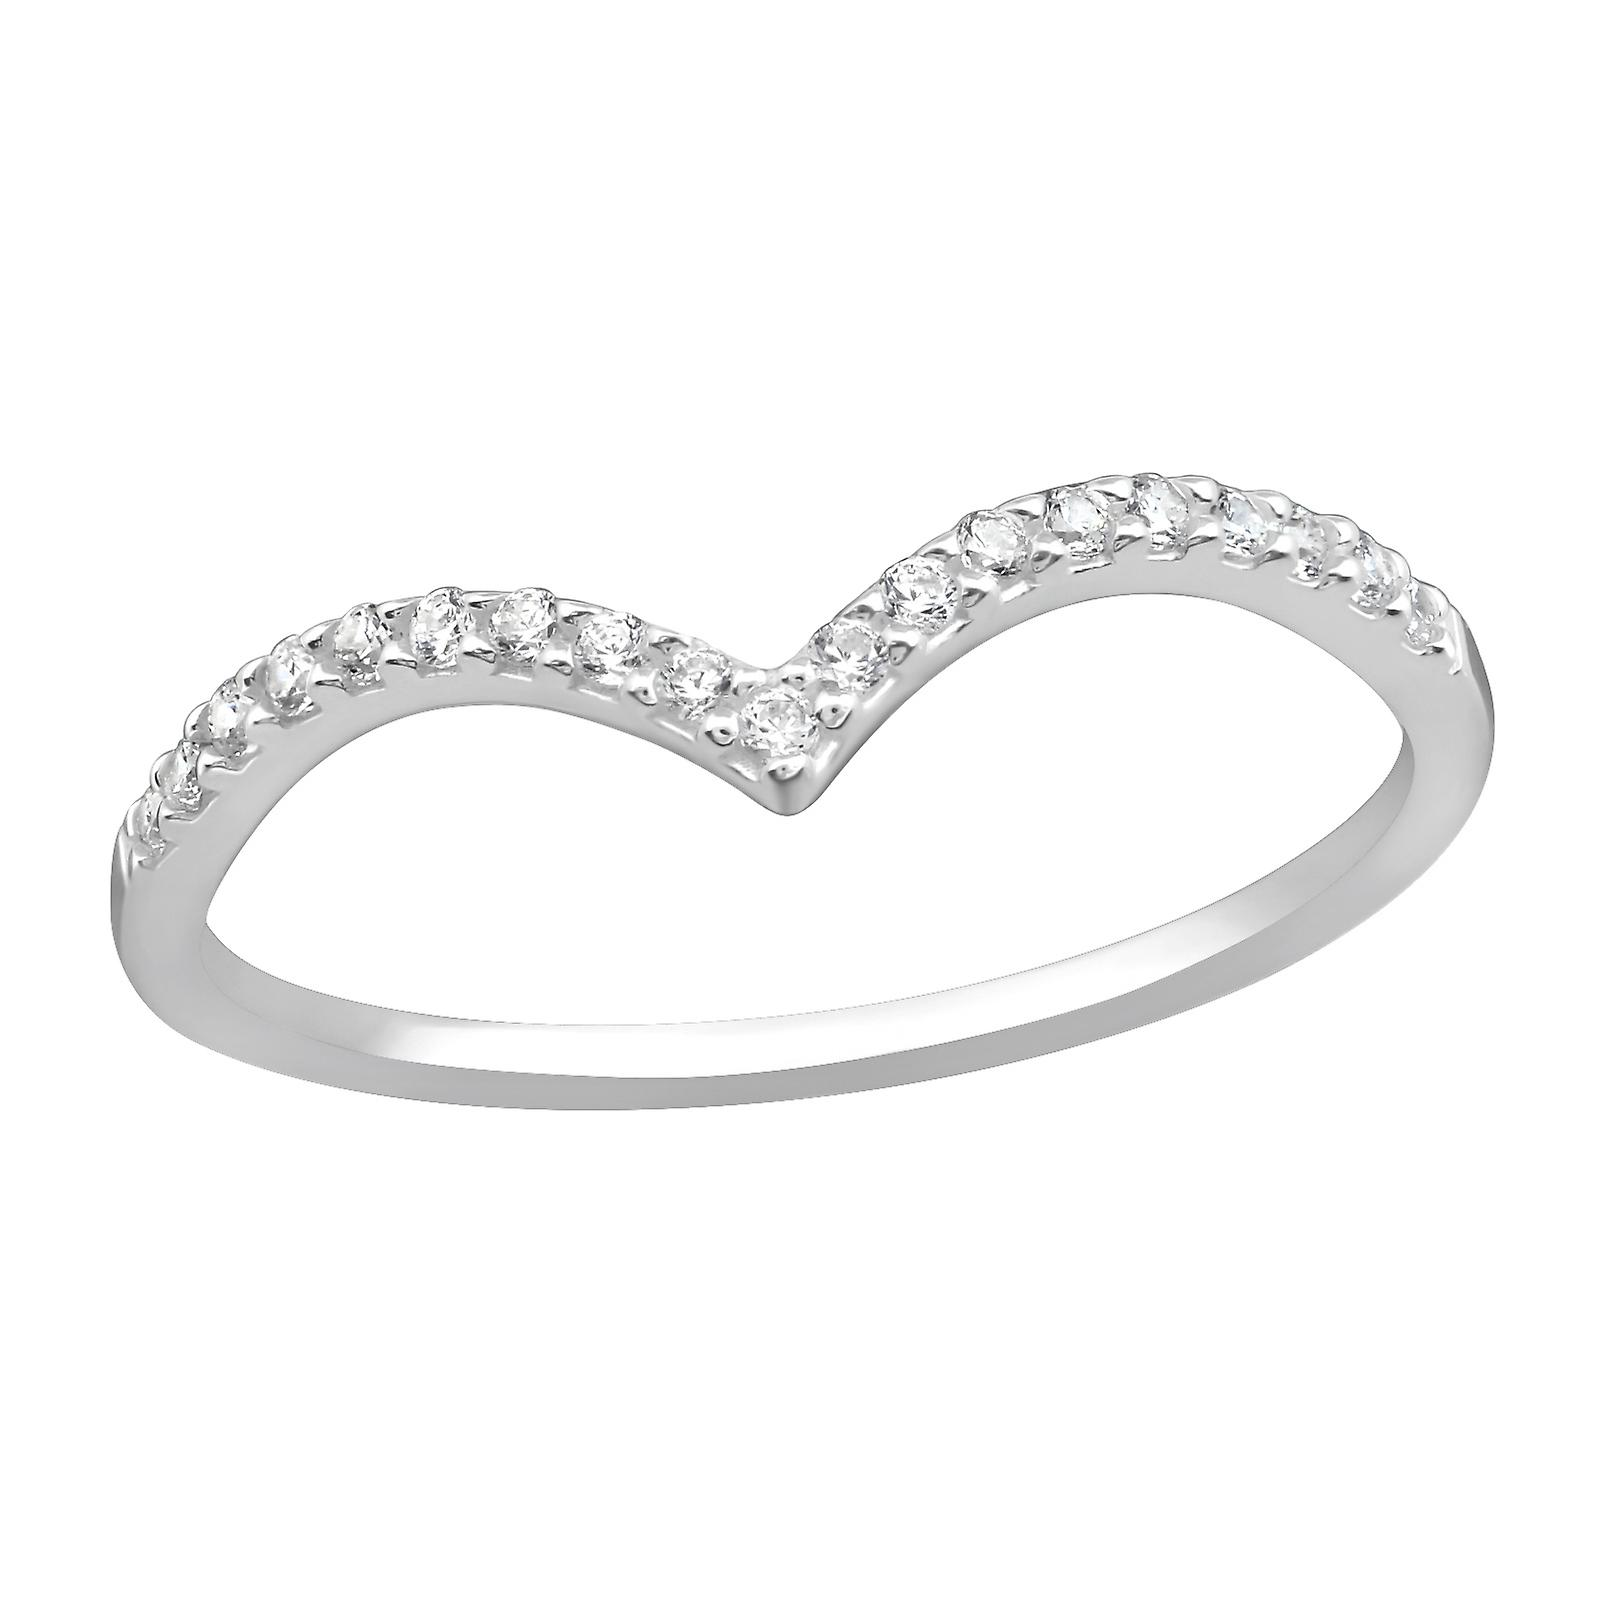 925 Argent rhodium 6 mm FW Cultured Bouton Pearl /& Bague Diamant QDX854 Taille 6-8